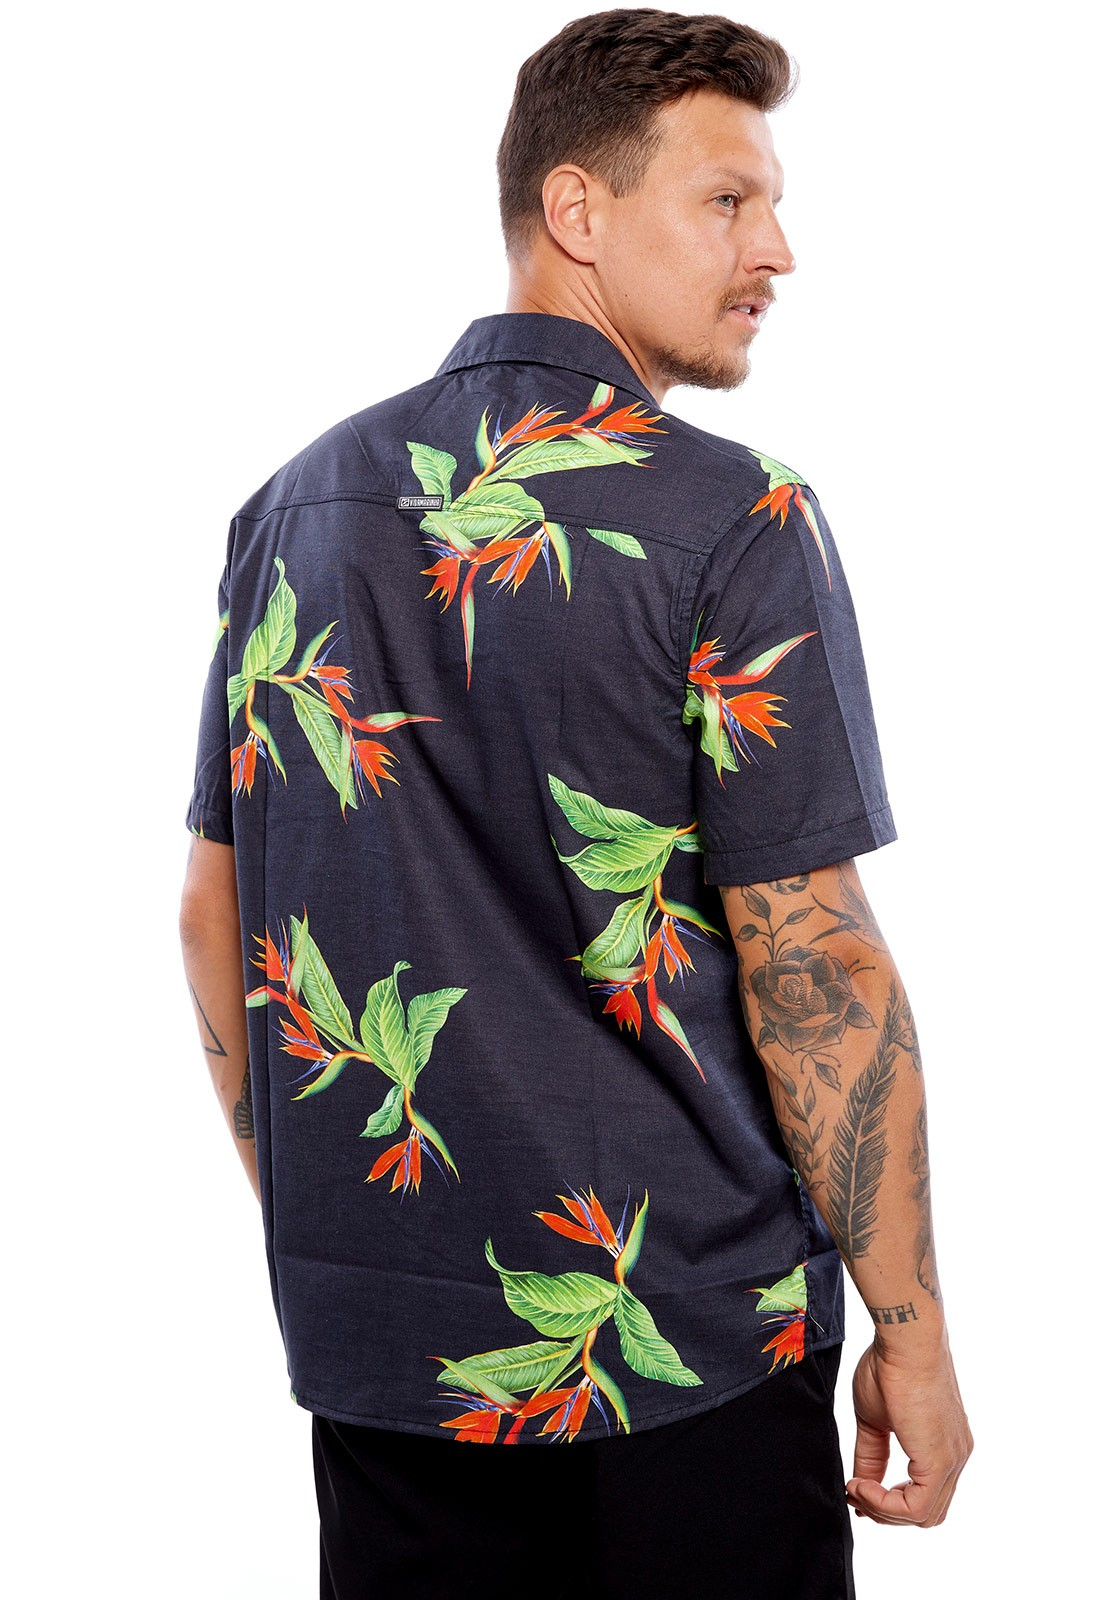 Camisa Vida Marinha Manga Curta Estampada Preta